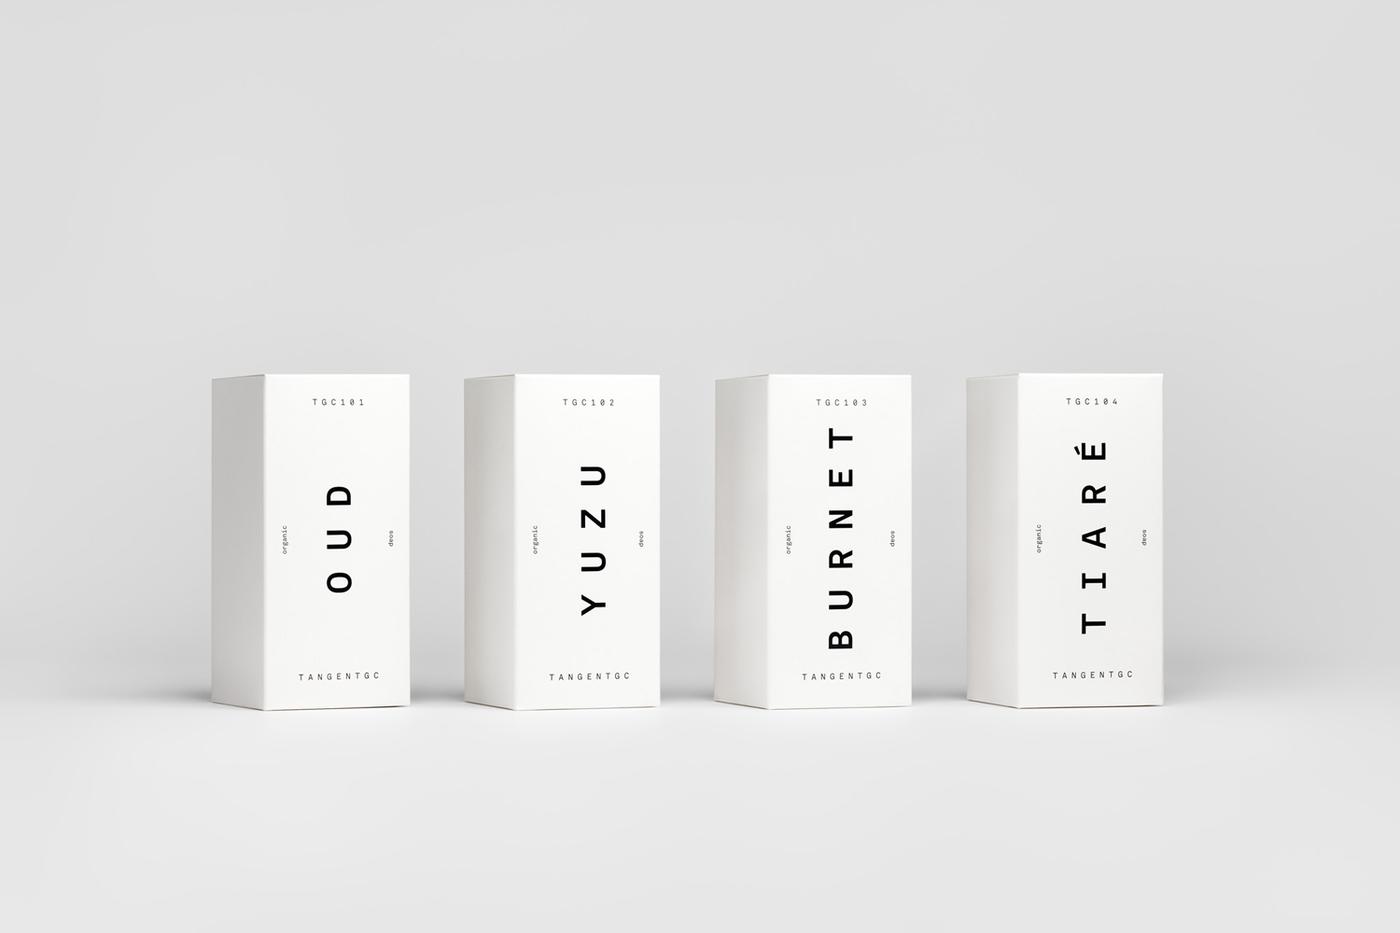 05-Tangent-GC-Soap-Packaging-Carl-Nas-Associates-London-UK-BPO.jpeg